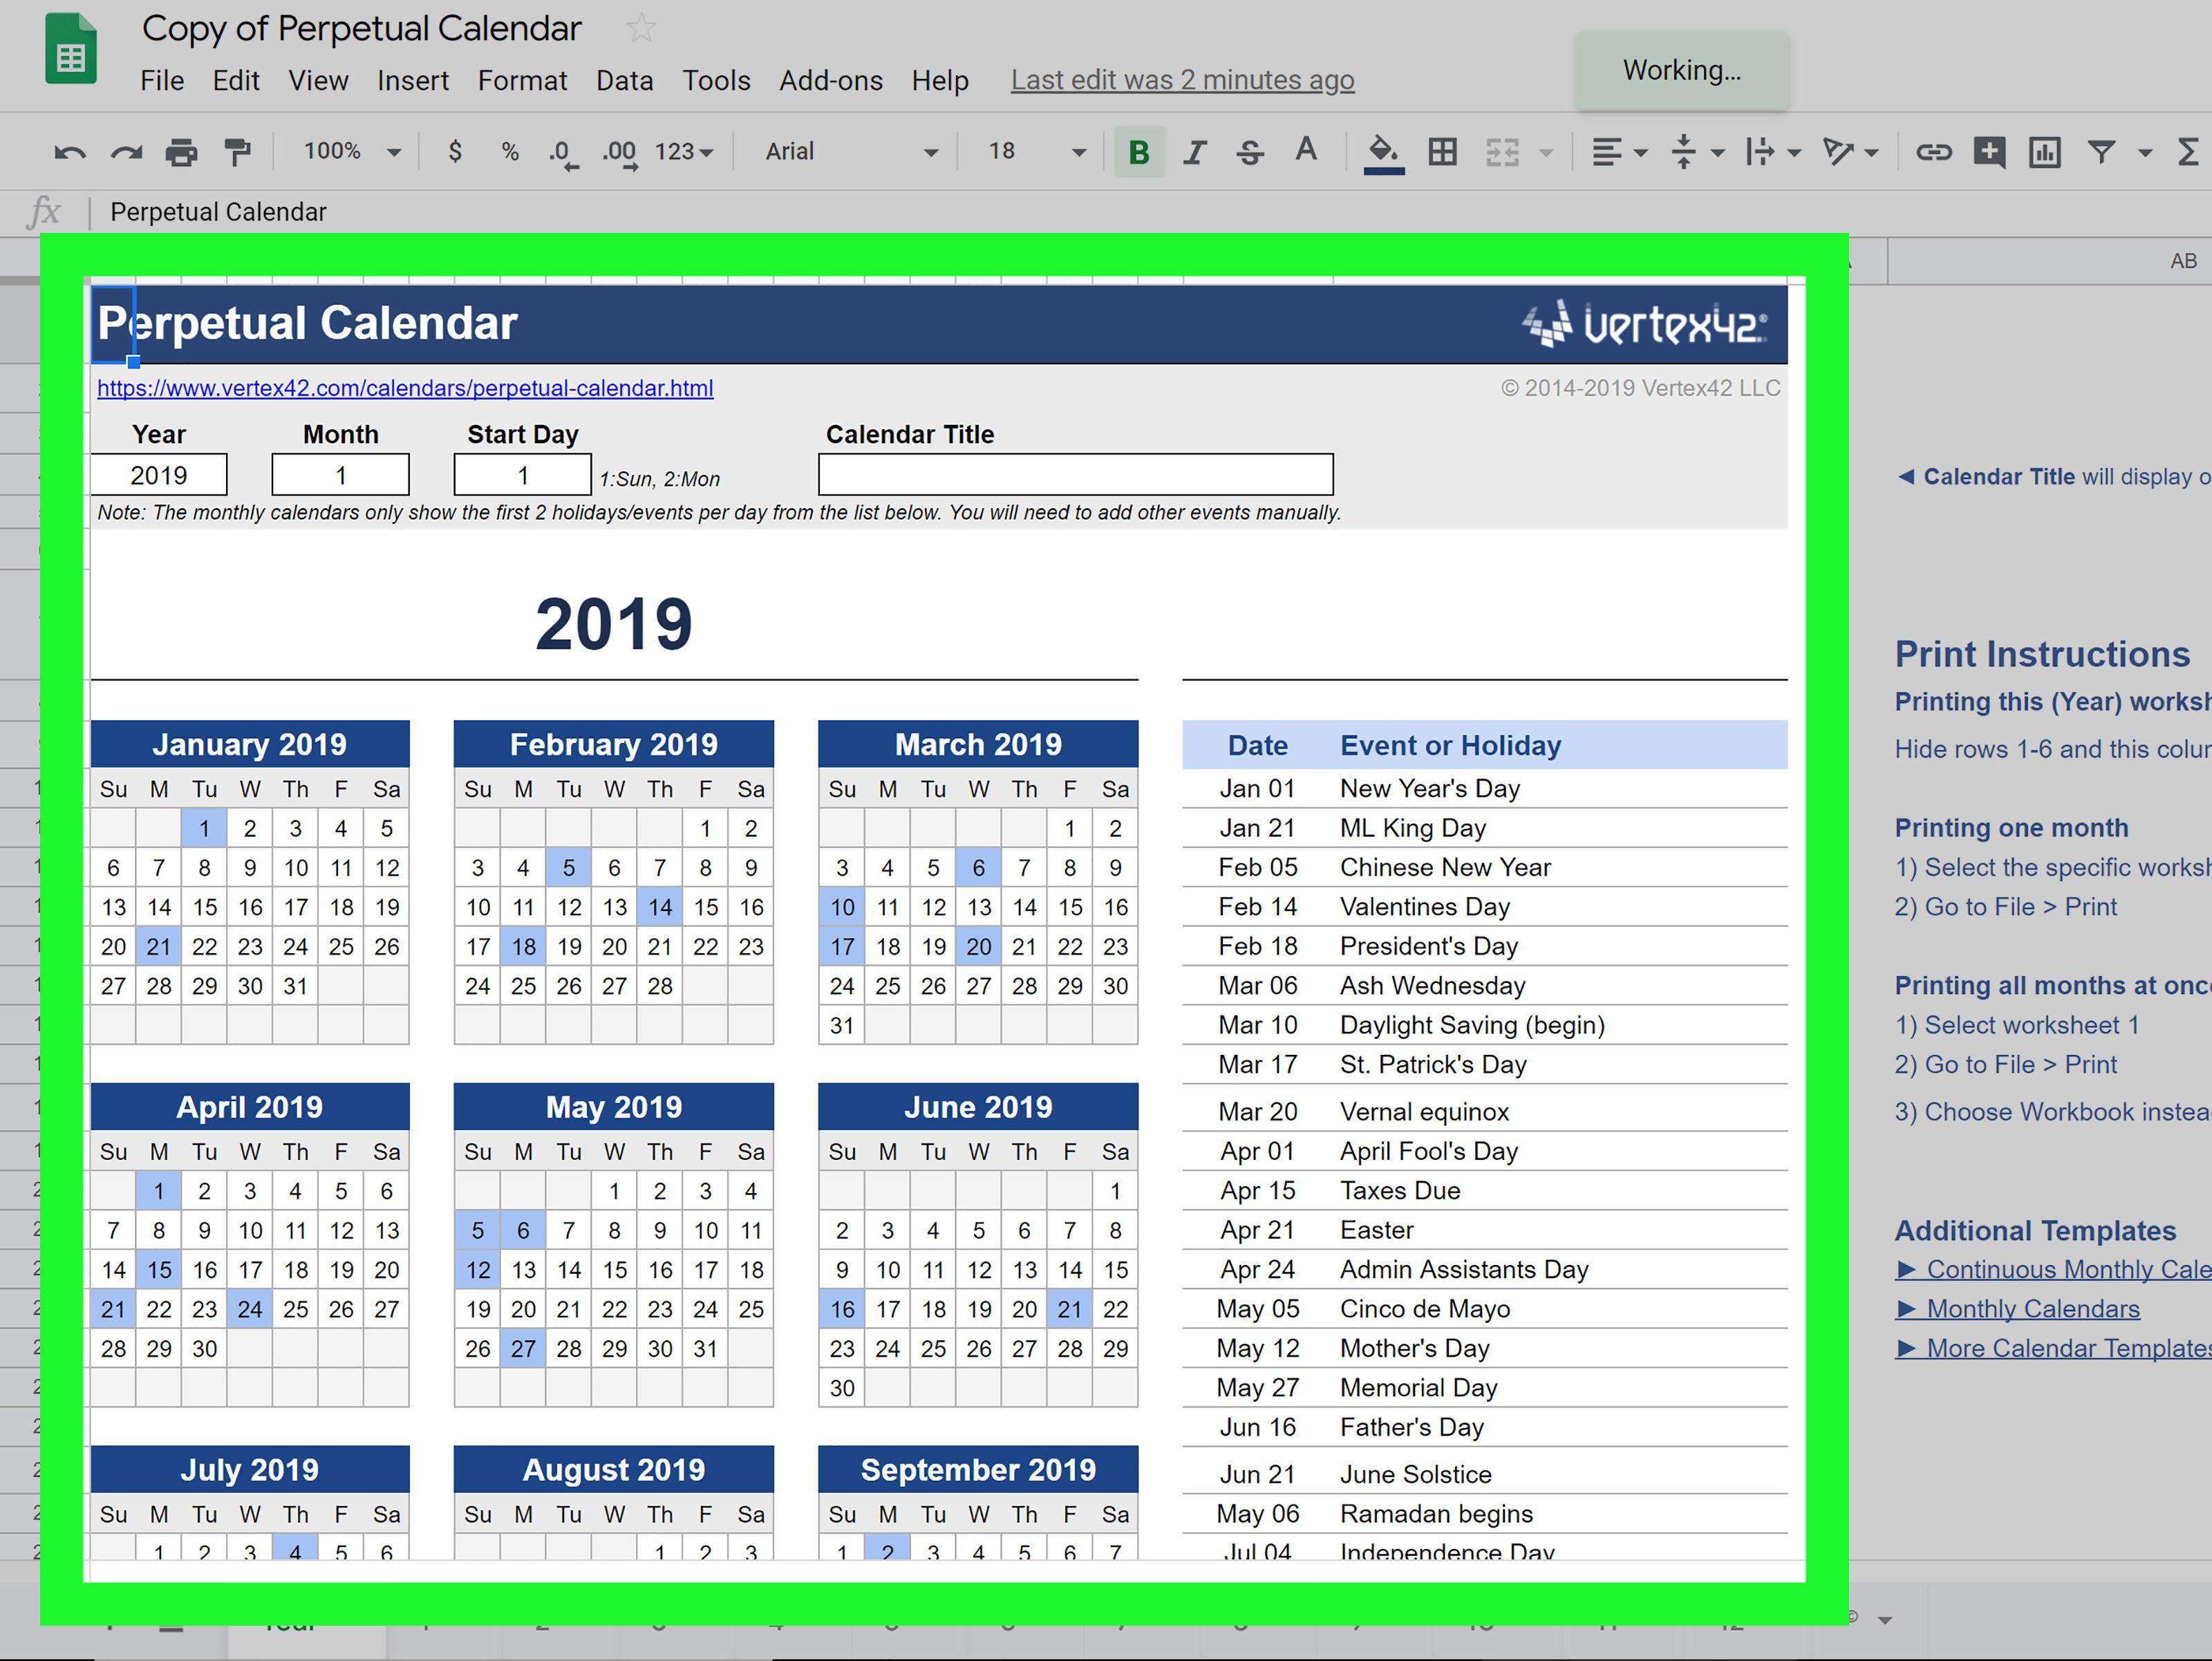 003 Wonderful Calendar Template Google Doc Idea  Docs Editable Two Week 2019-20Full